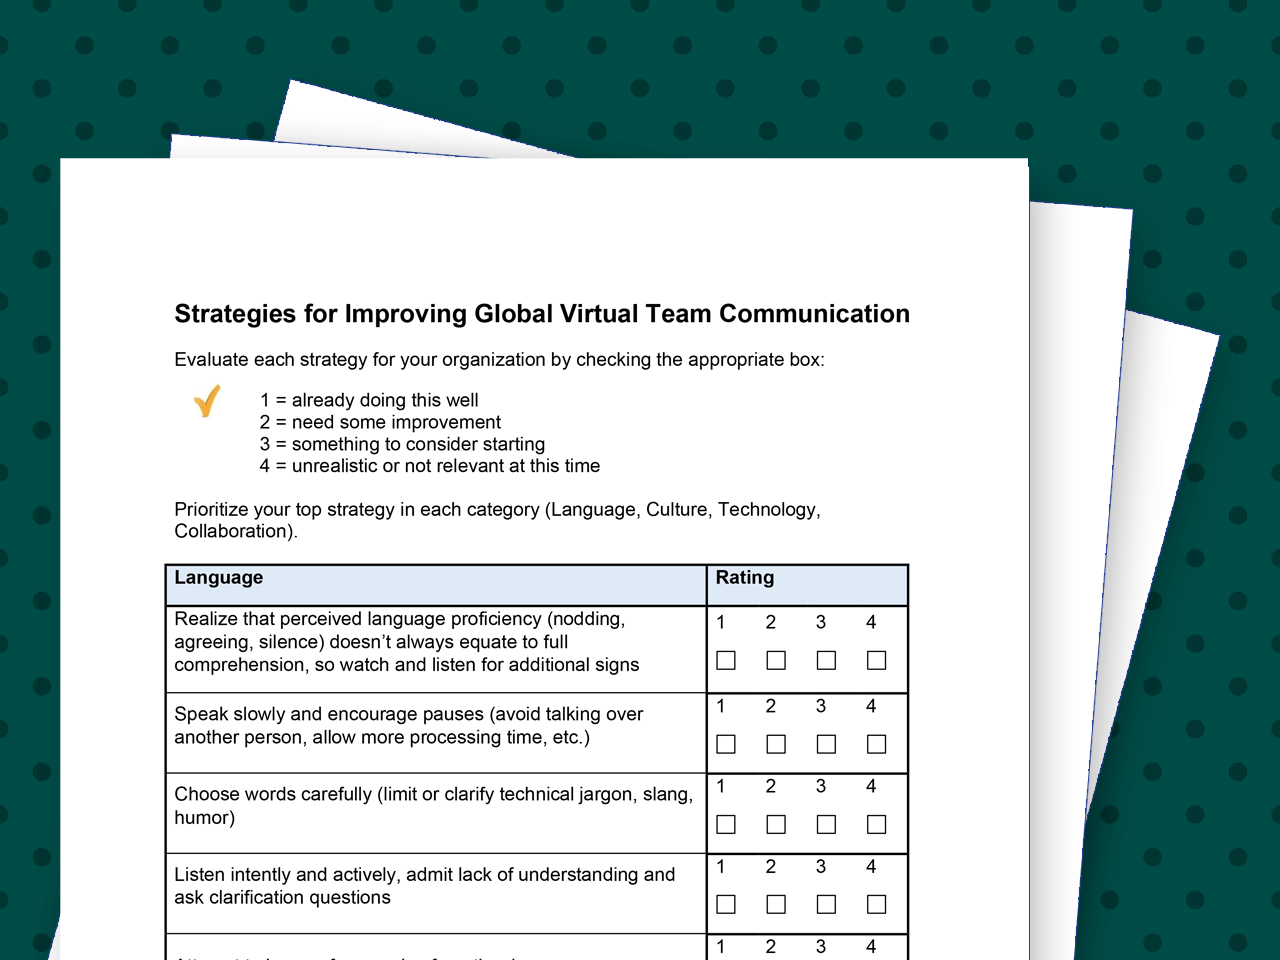 Strategies for Improving Global Virtual Team Communication